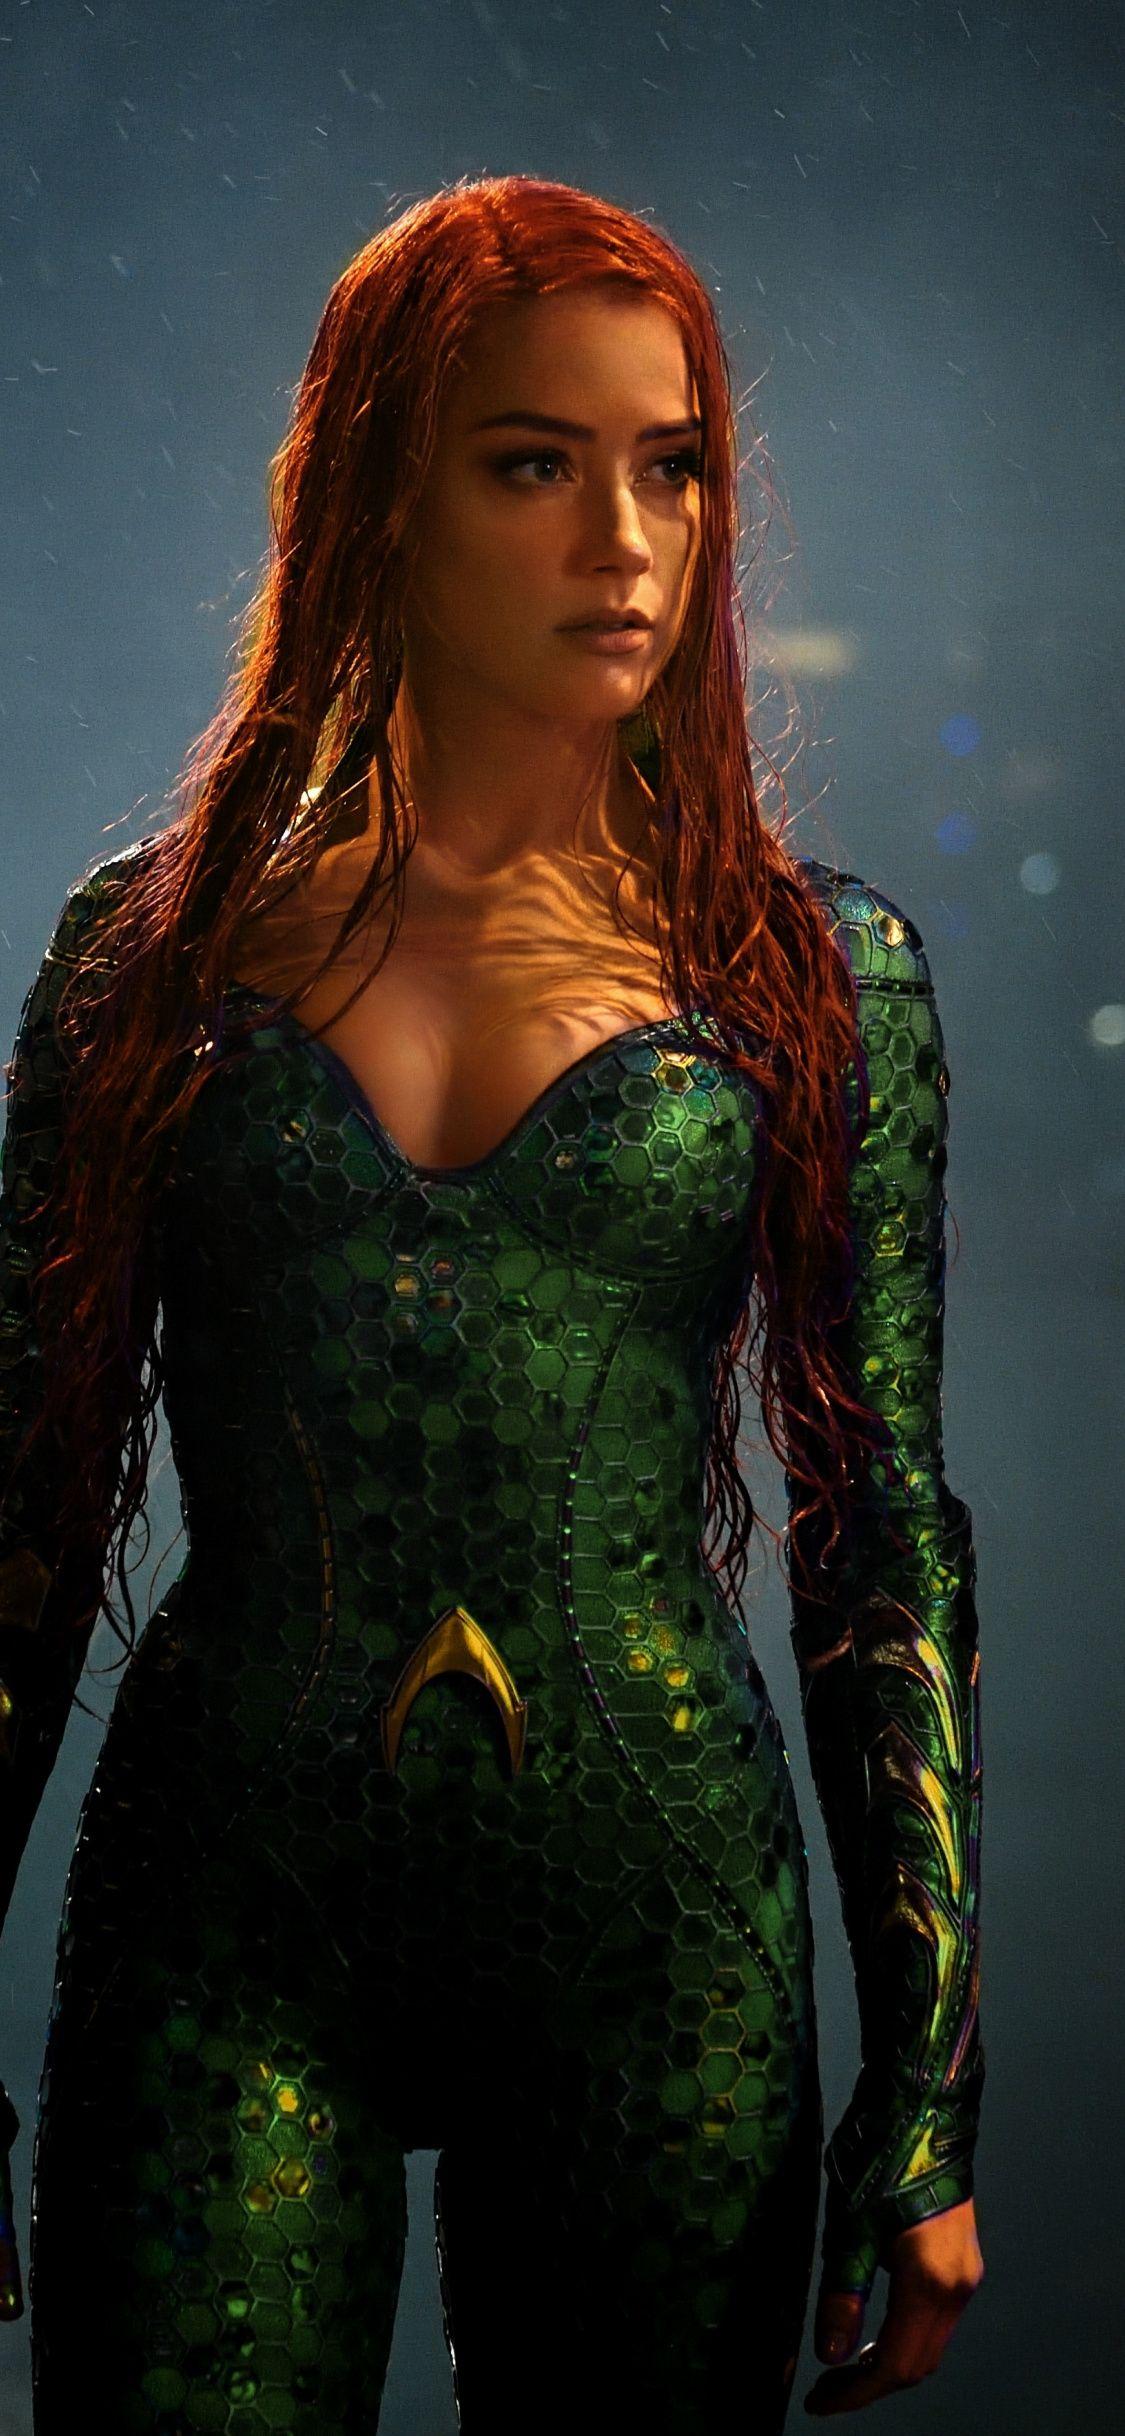 Movie Aquaman Amber Heard Mera 1125x2436 wallpaper Mera 1125x2436